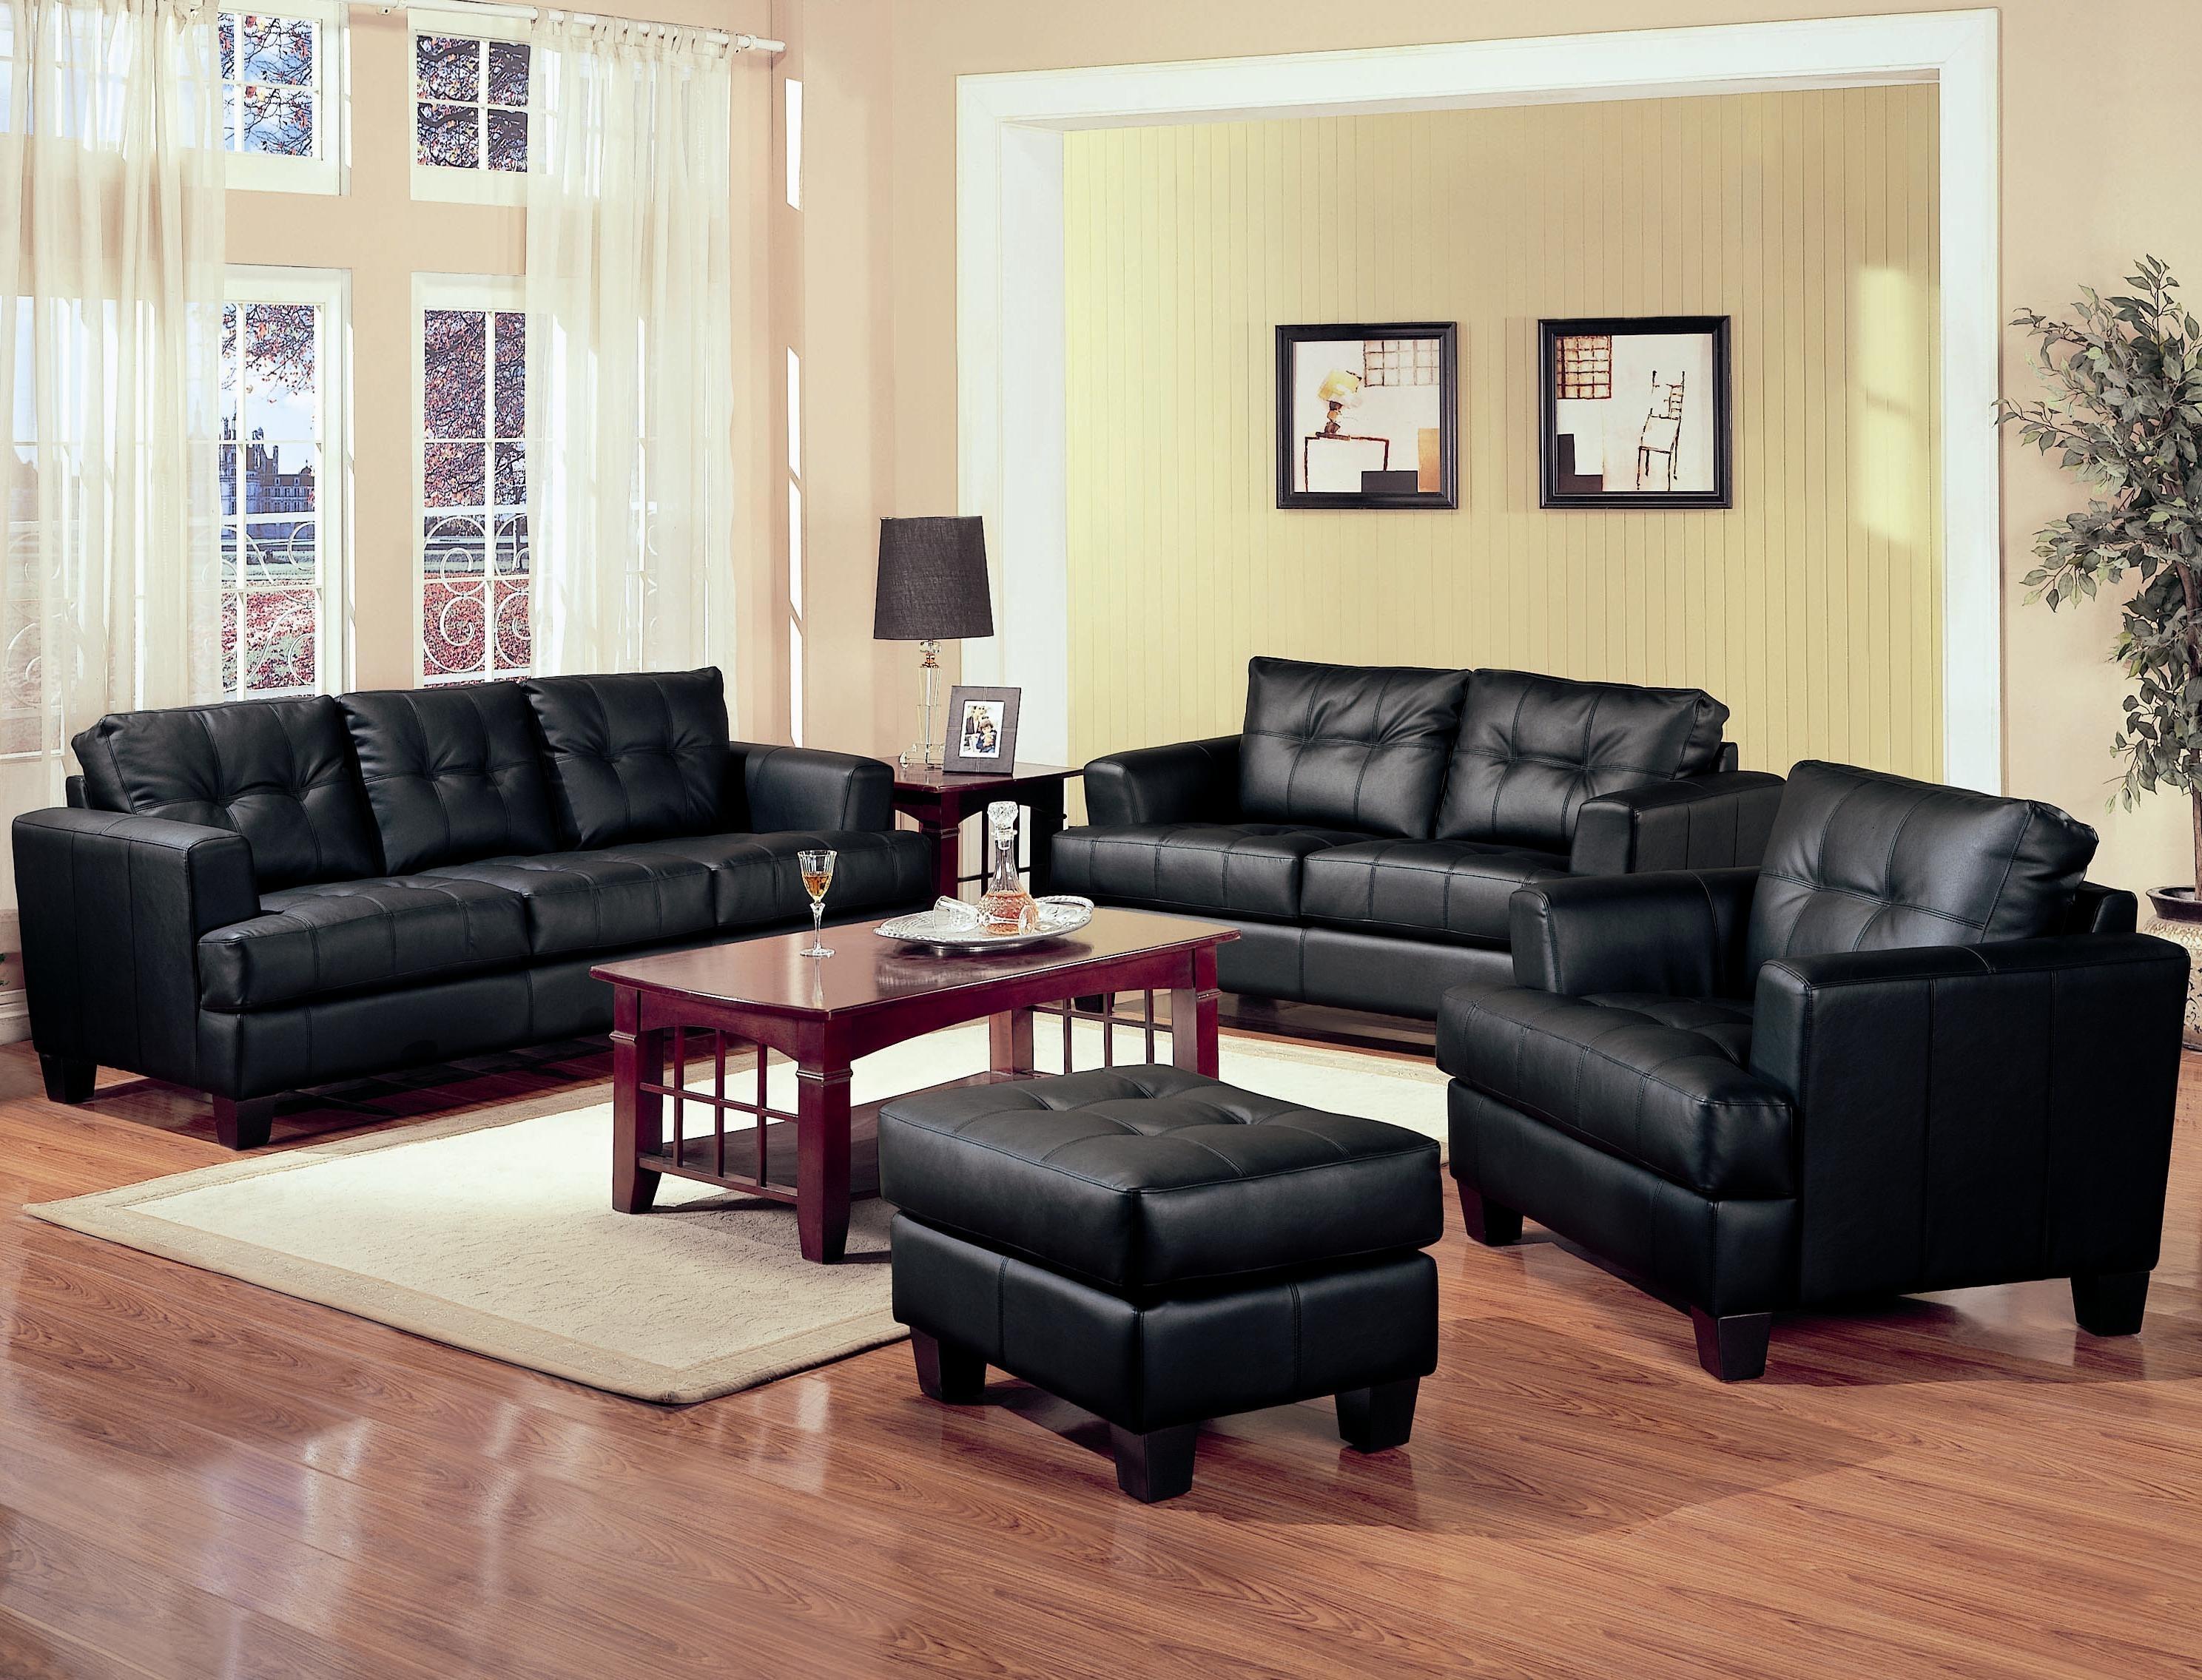 Apartment Size Sleeper Sofa Design - HomesFeed